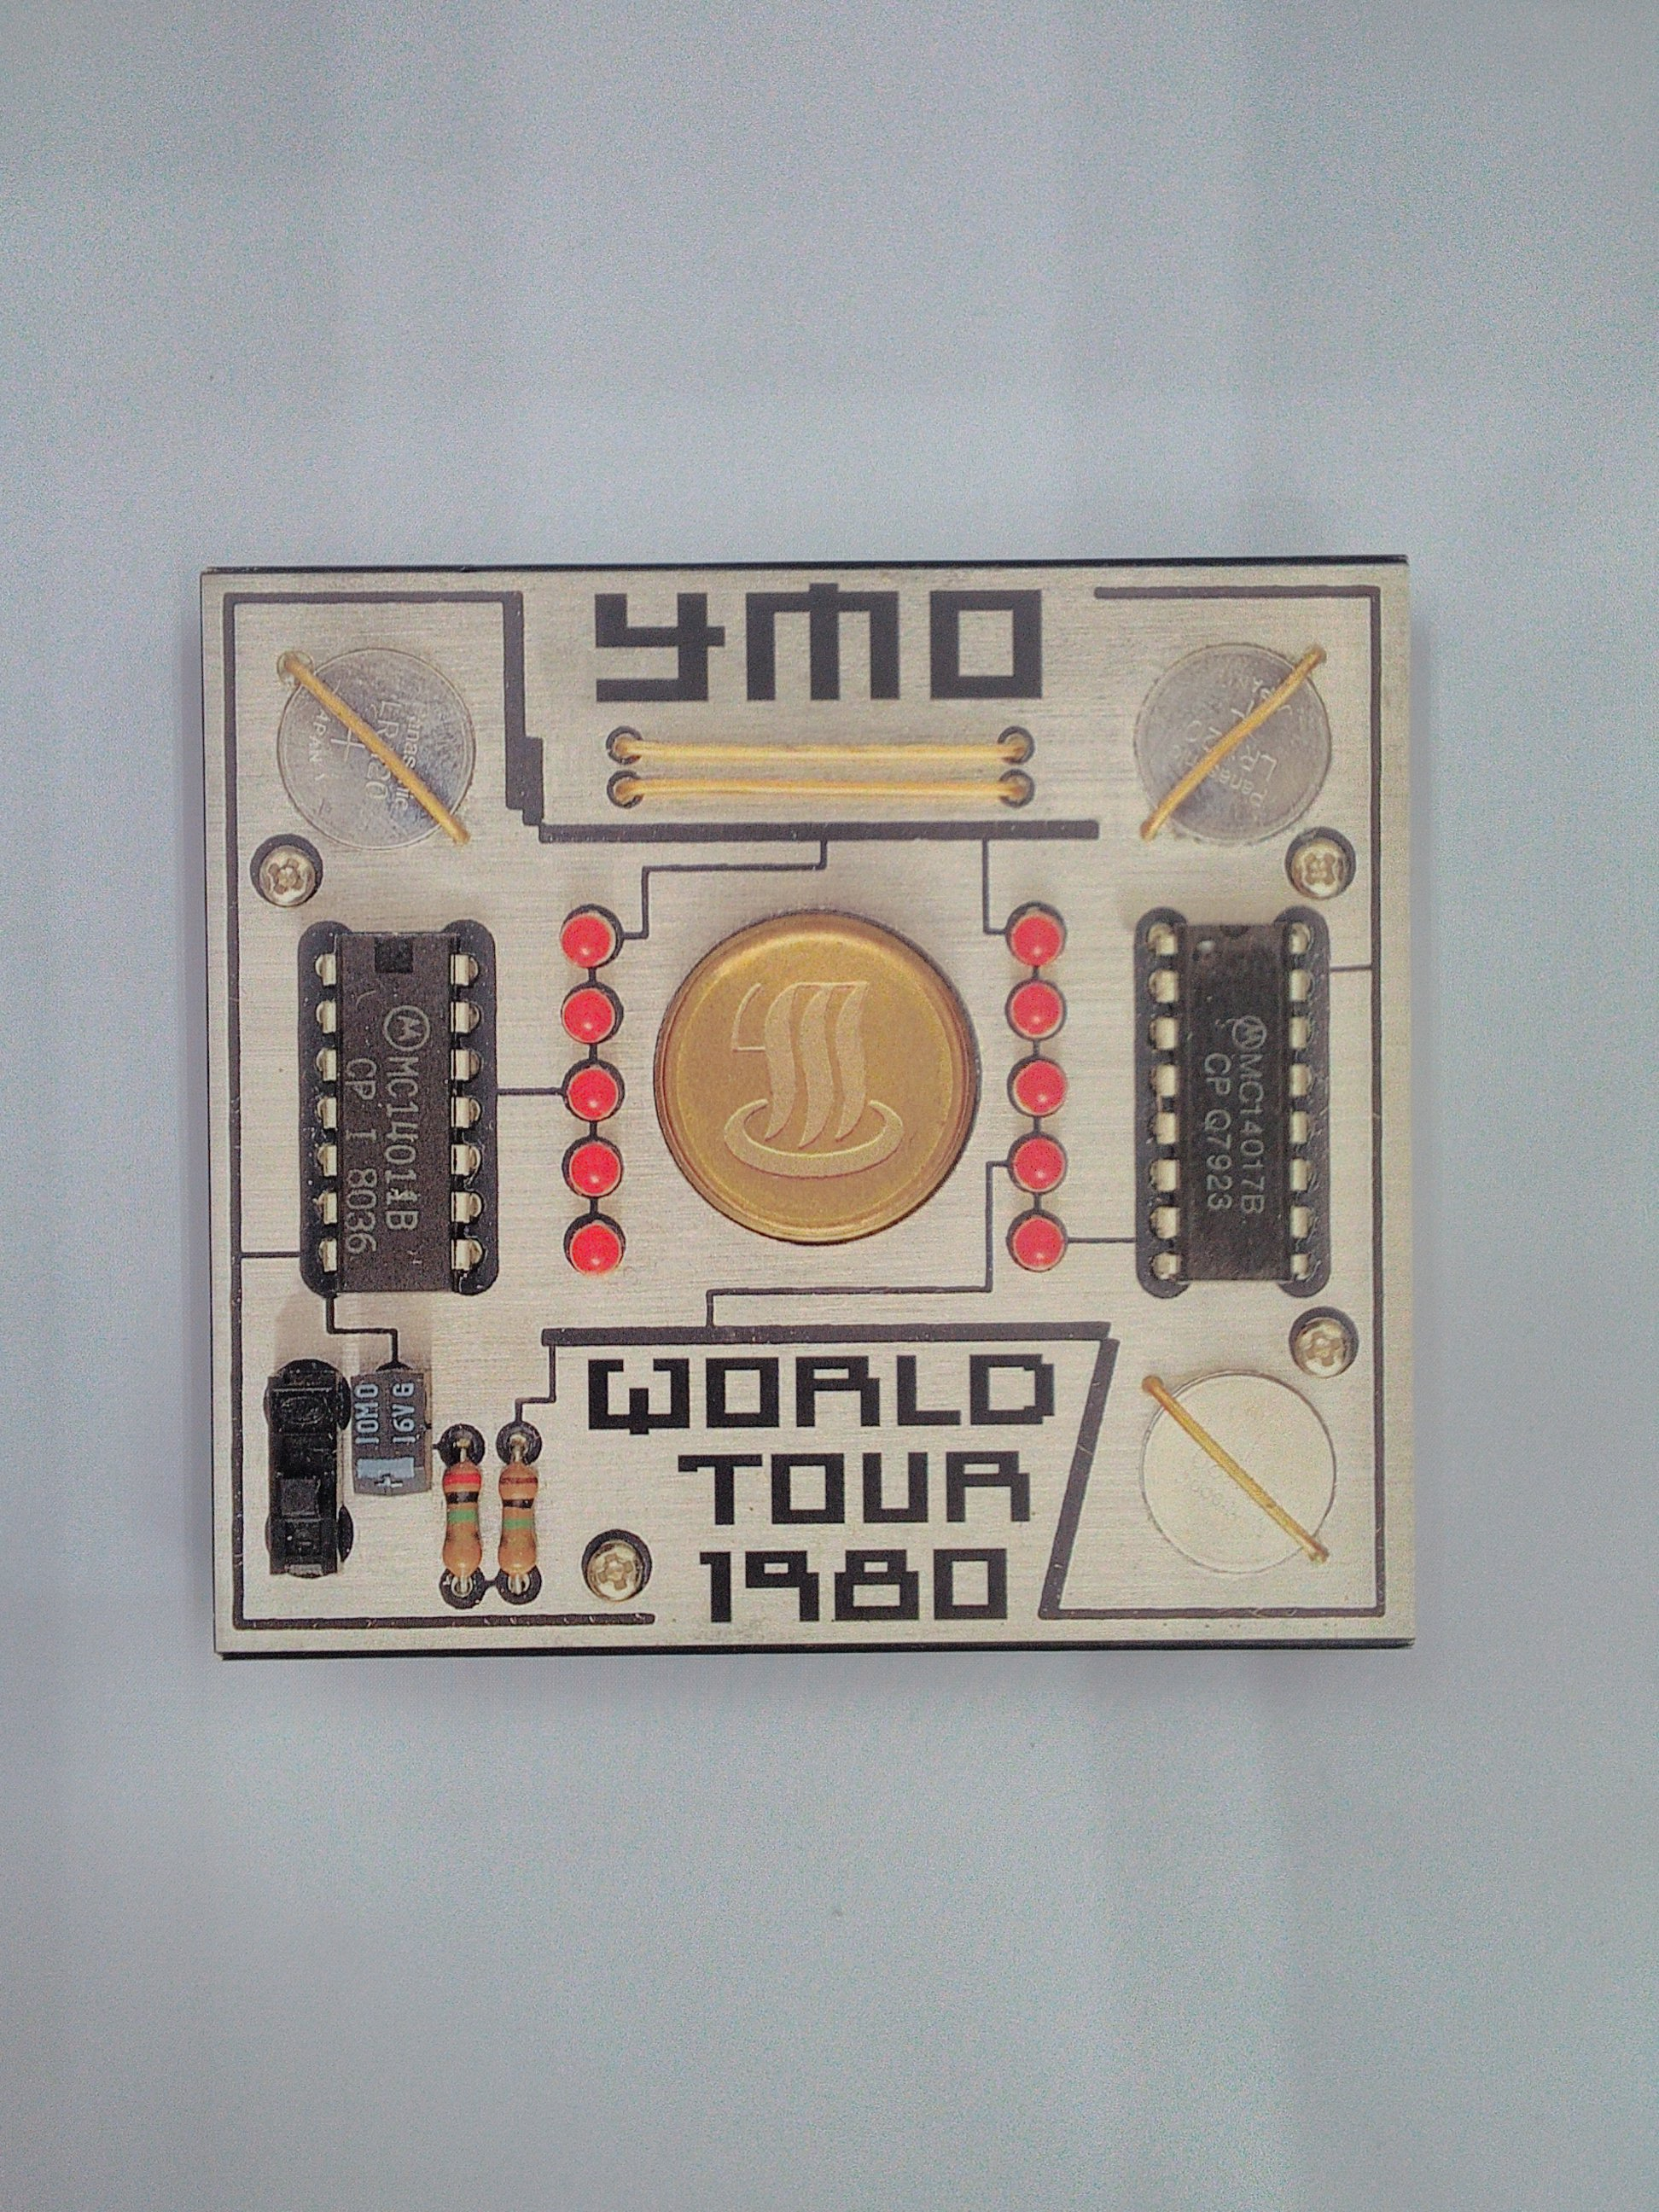 WORLD TOUR 1980 YMO/ALCA-5065 アルファミュージック